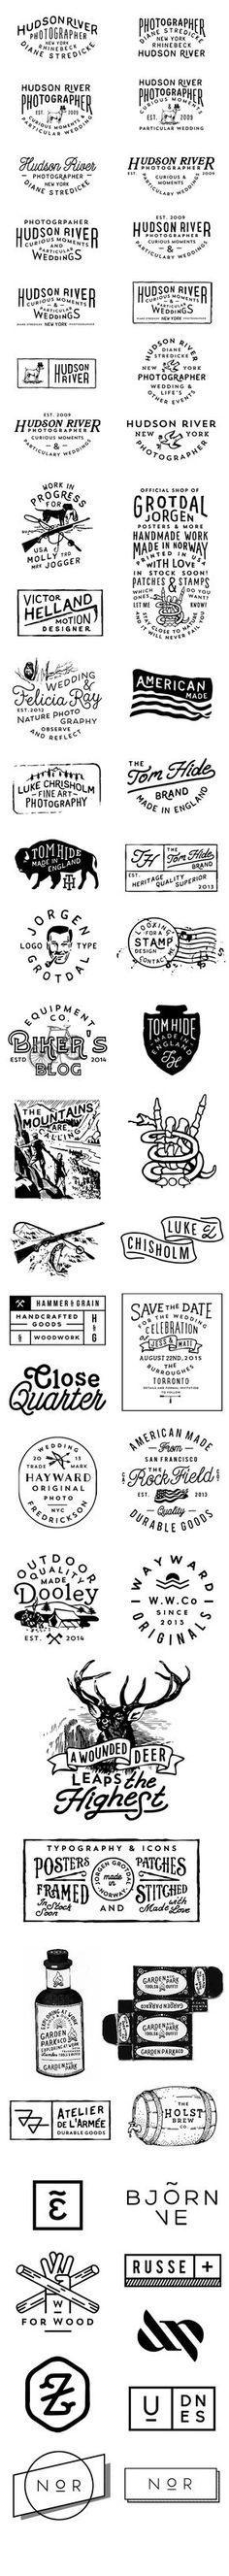 2014 pt.1 on Typography Served